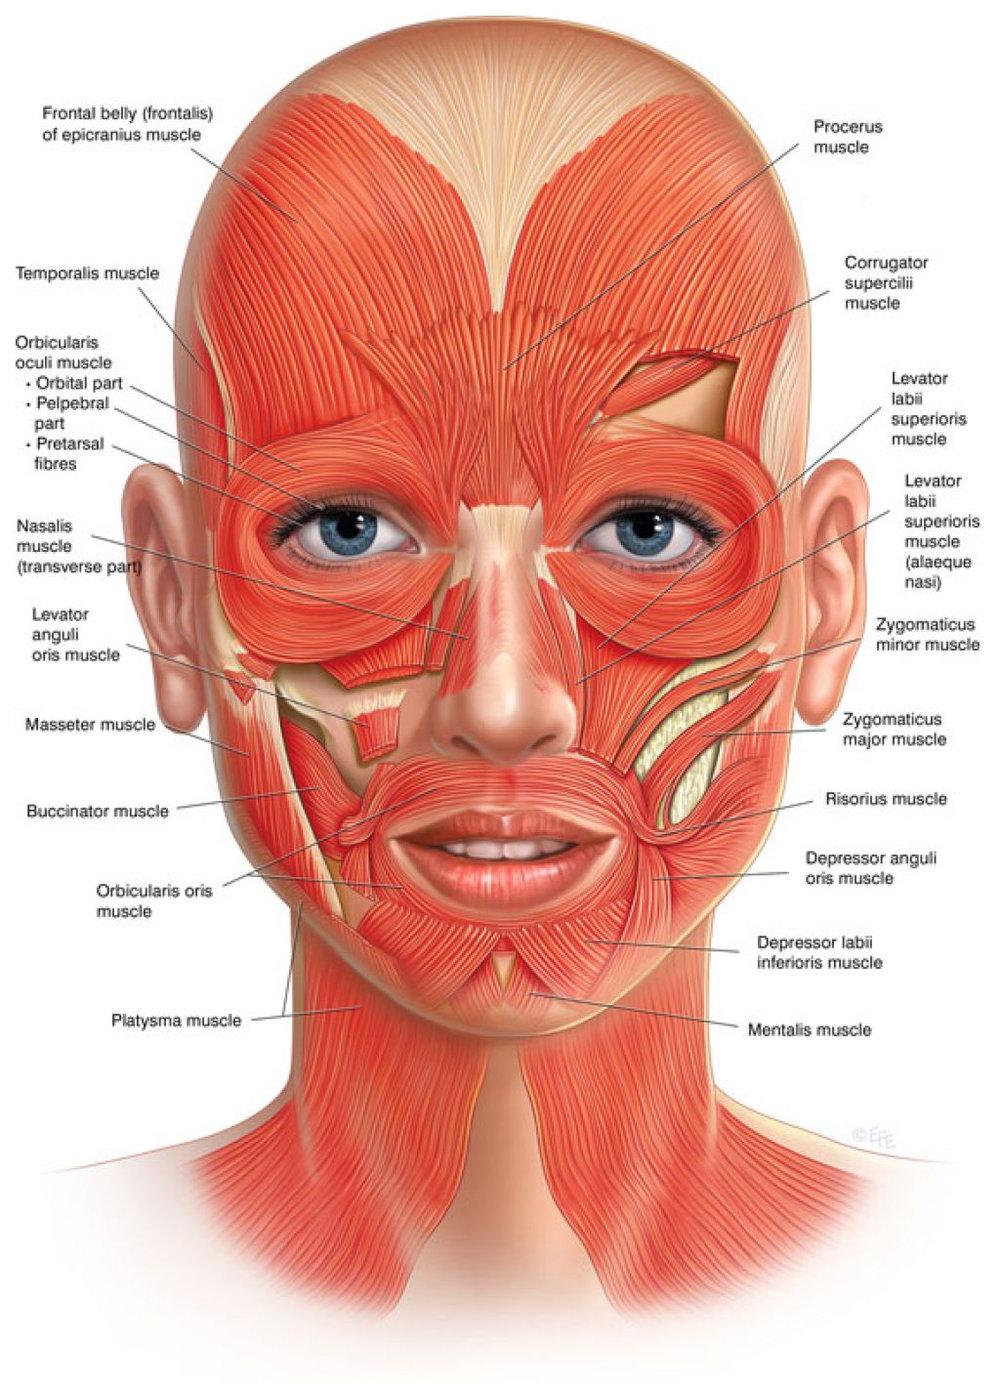 anatomy-diagram-muscles-face-anatomy-facial-muscles-diagram-anatomy-diagram-pics.jpg